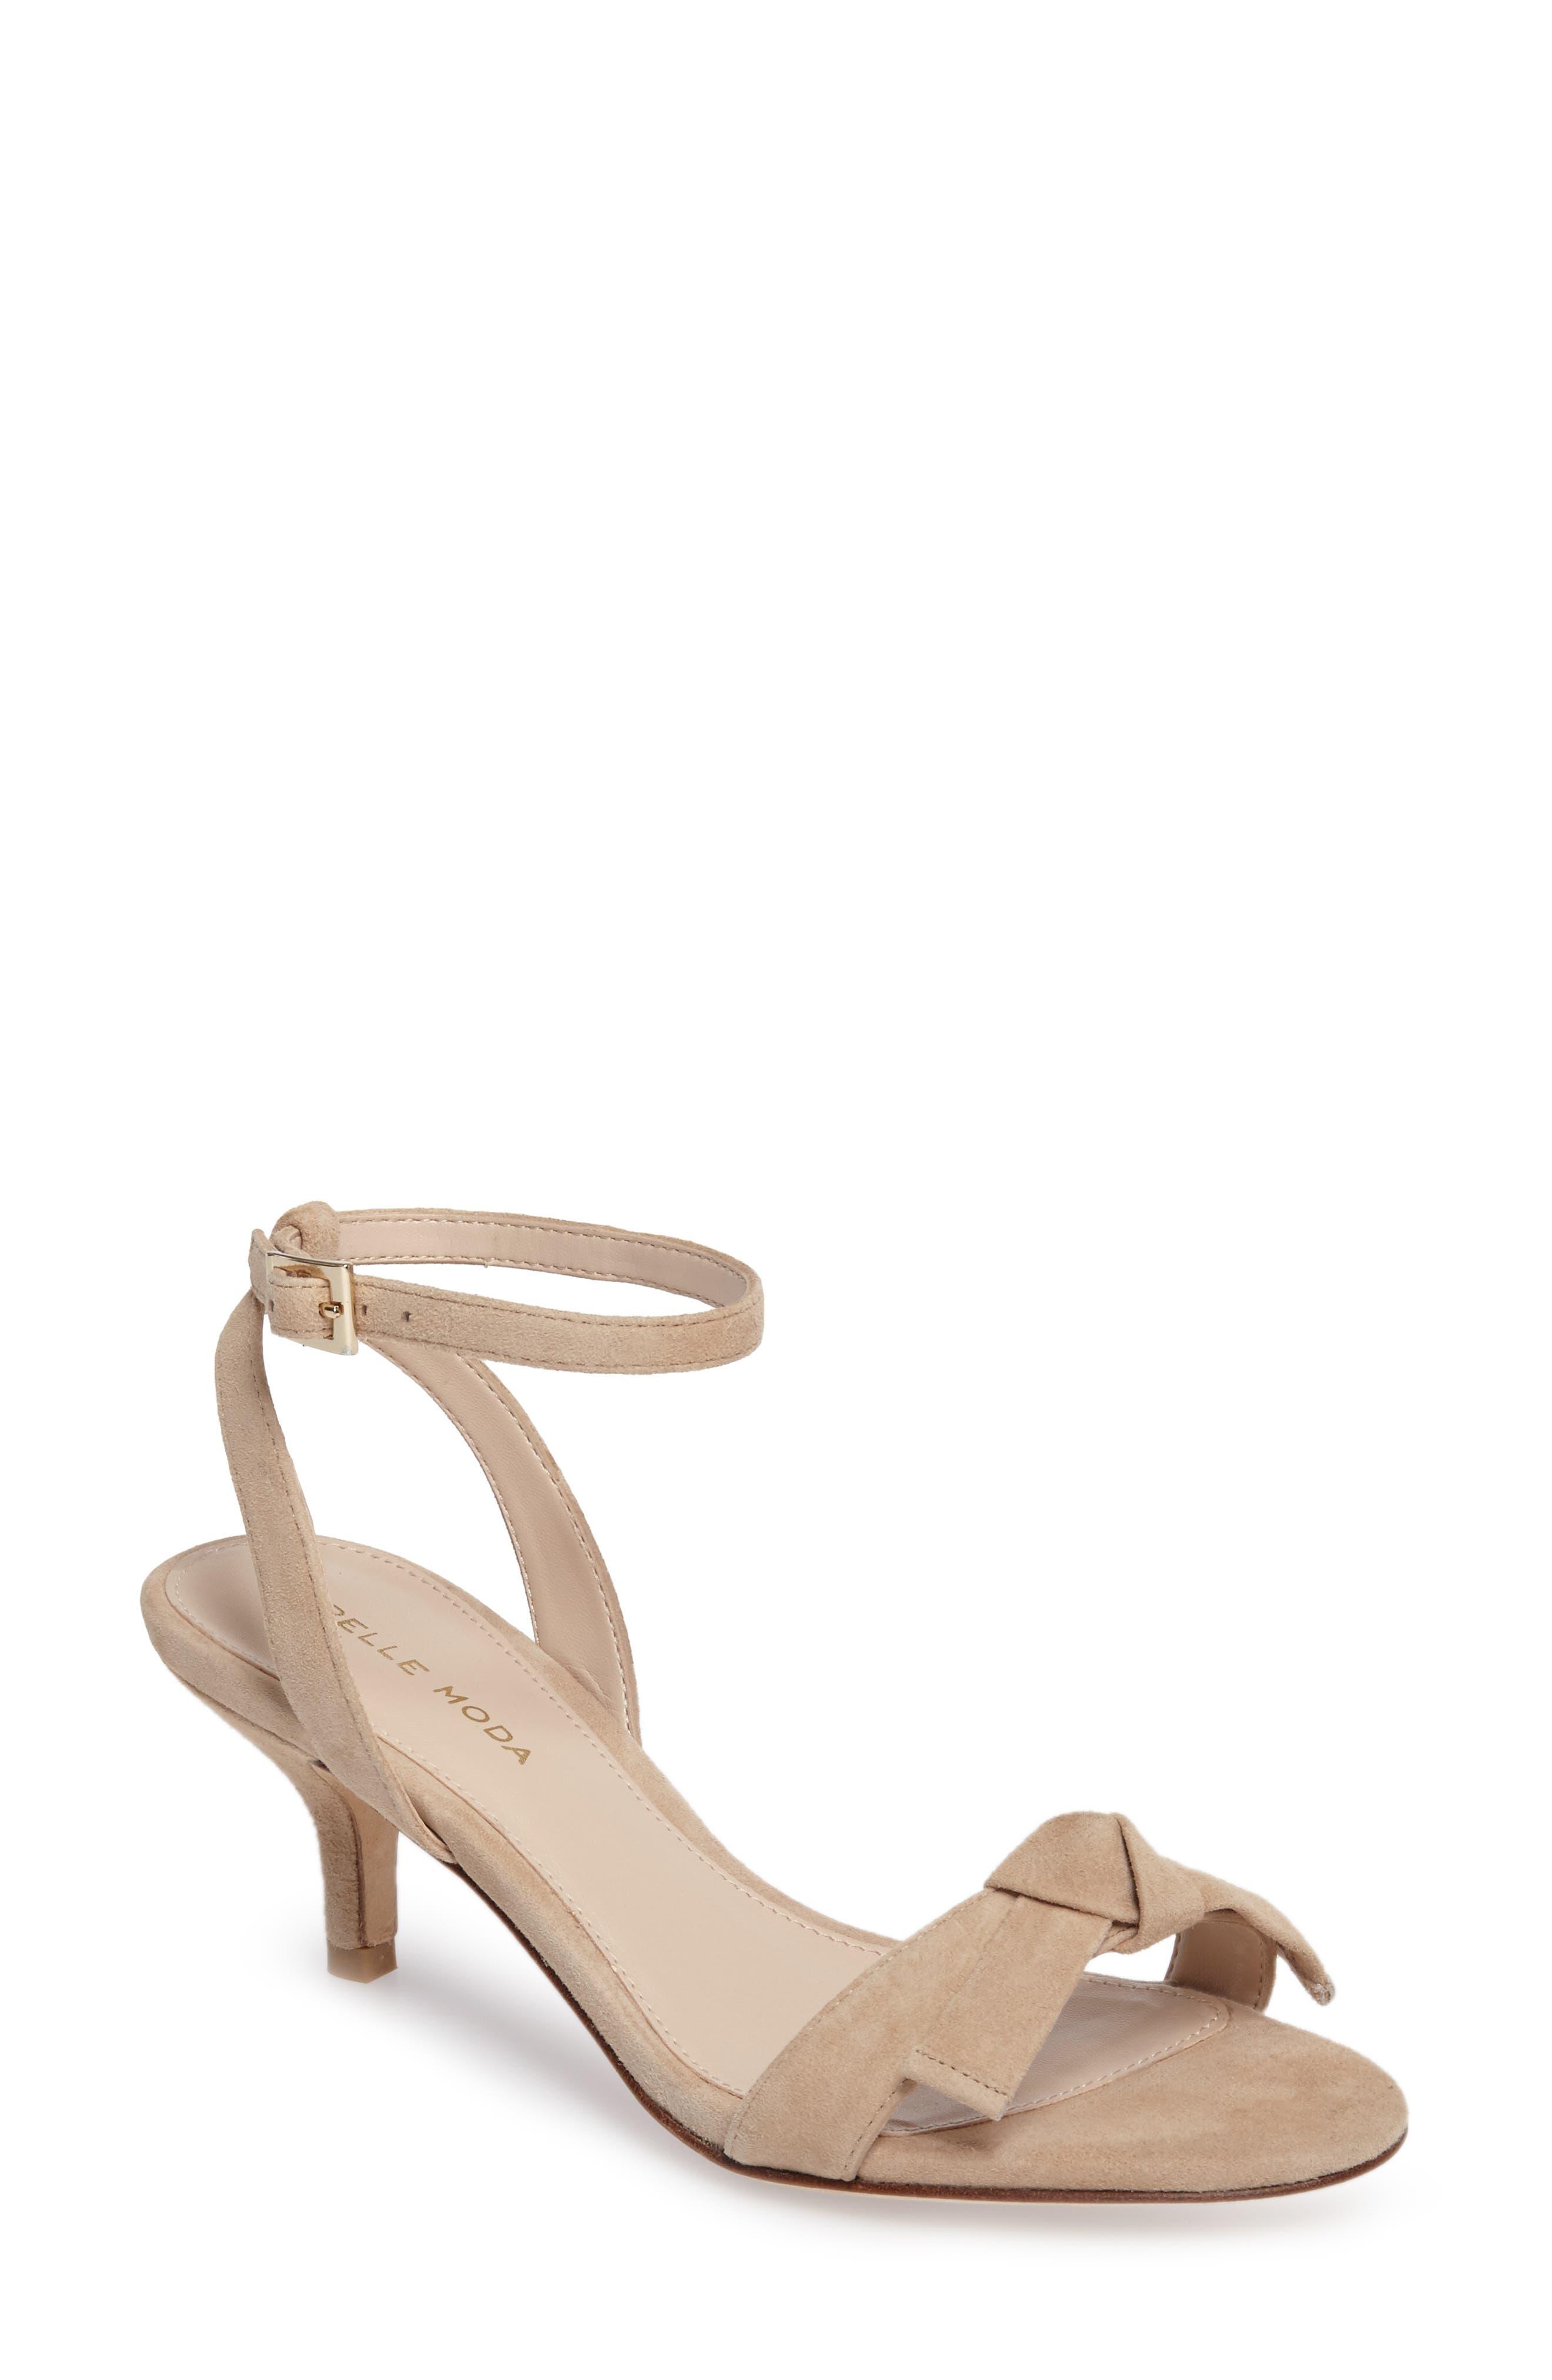 Main Image - Pelle Moda Alexia 2 Sandal (Women)